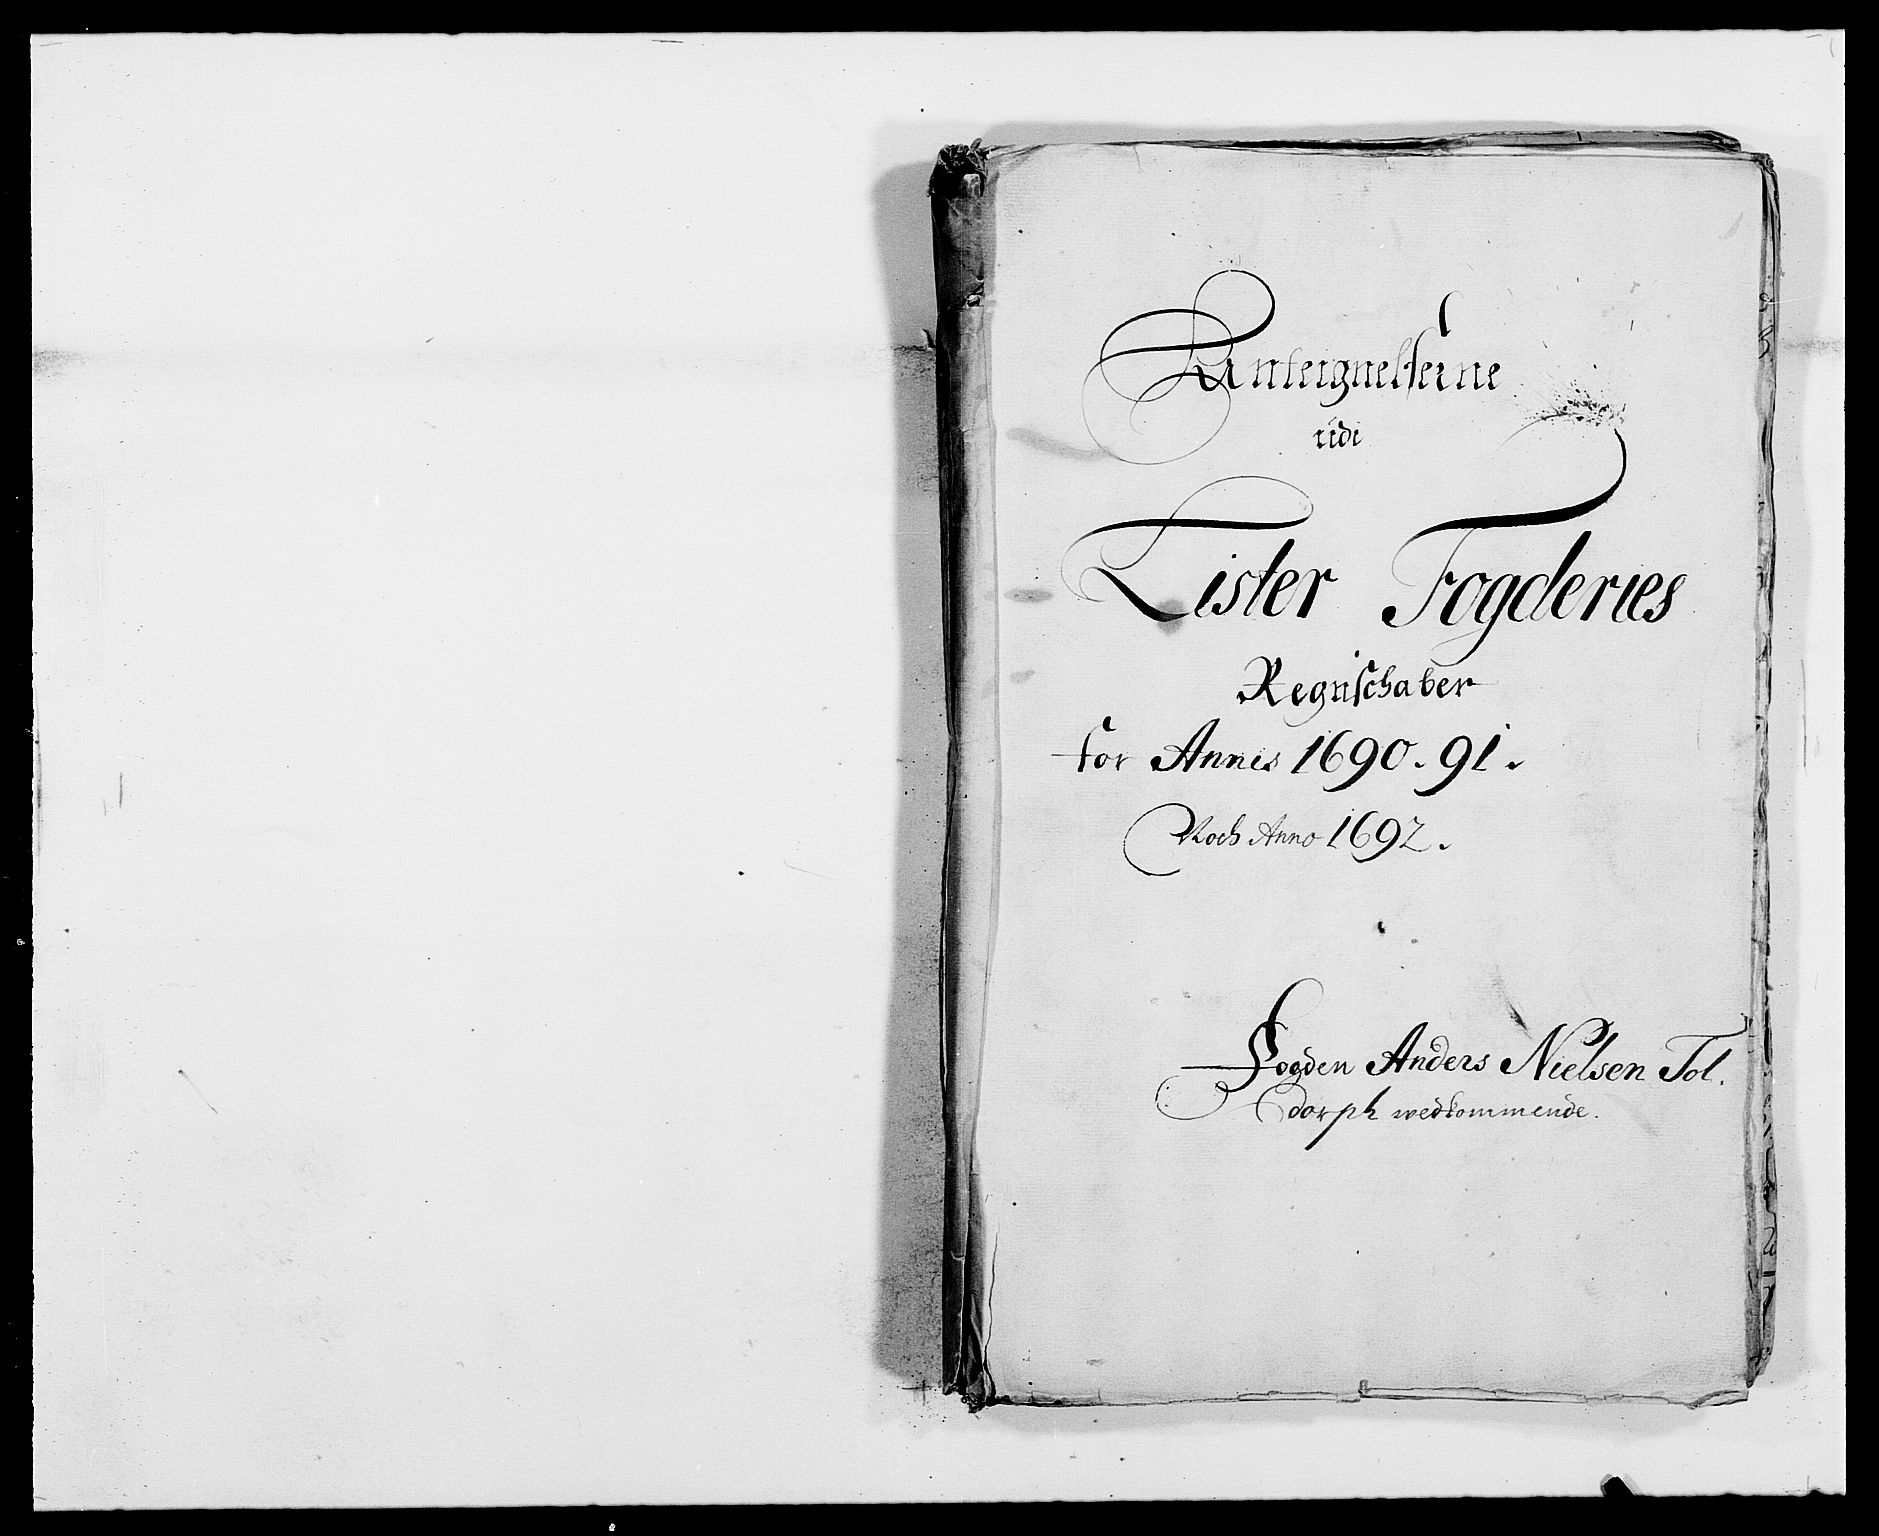 RA, Rentekammeret inntil 1814, Reviderte regnskaper, Fogderegnskap, R41/L2536: Fogderegnskap Lista, 1690-1693, s. 276